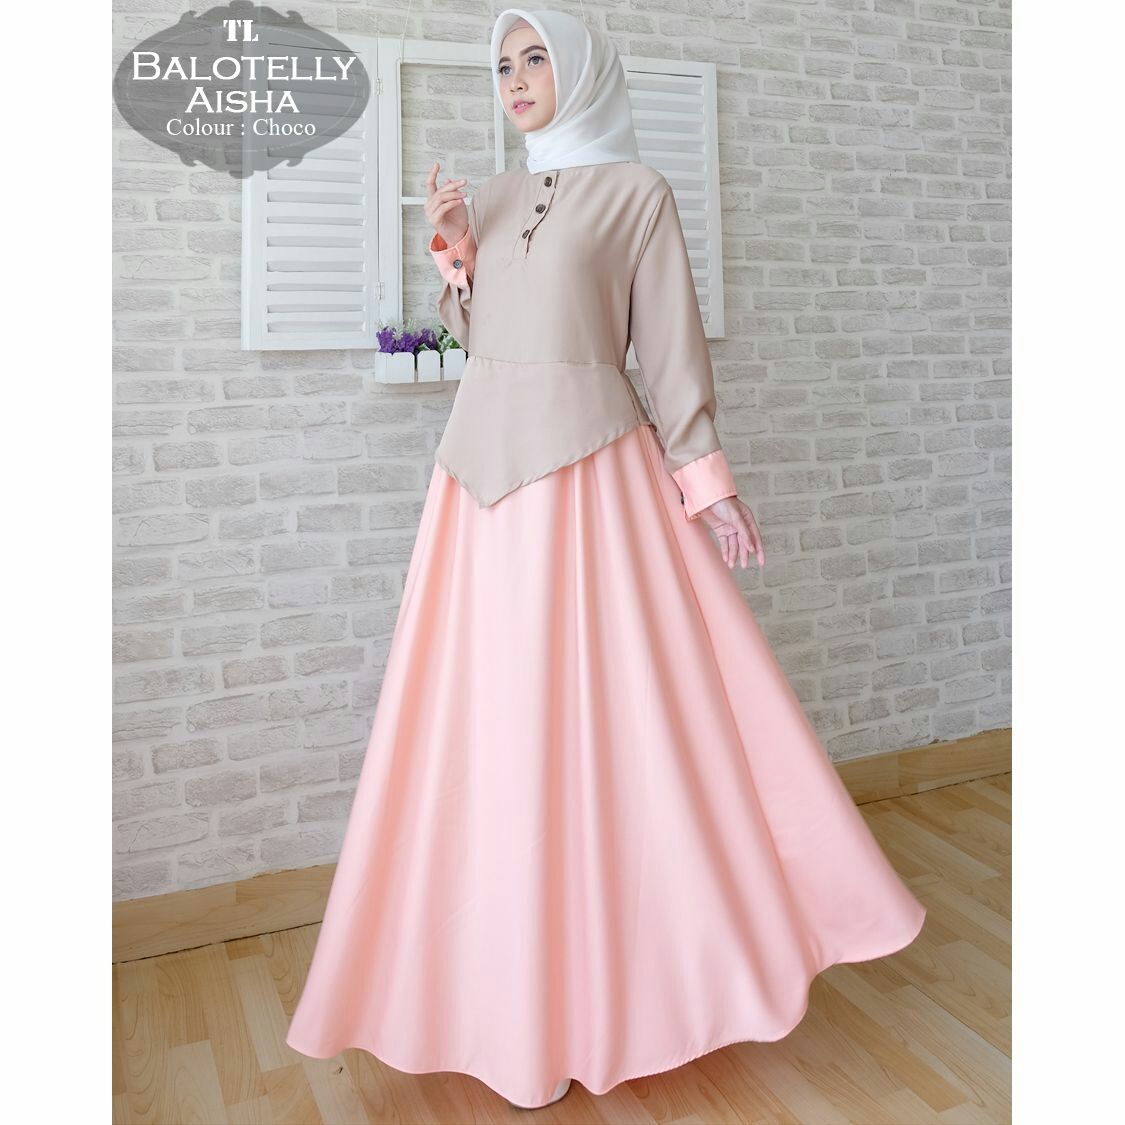 Gamis Baloteli Polos Aisha Maxi - Baju Muslim Modern  Model